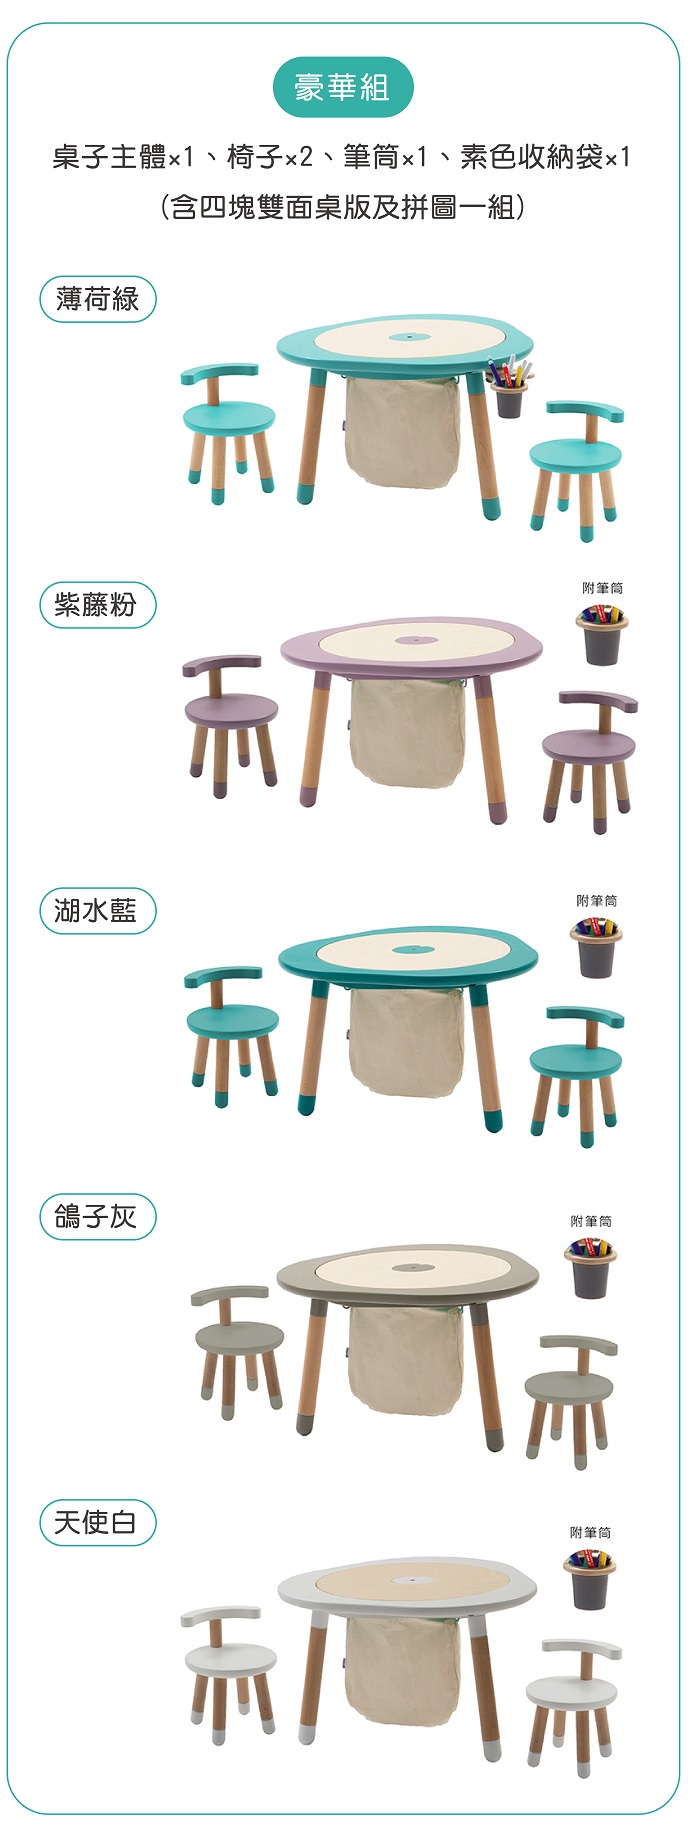 NOMI|MUTable 親子魔法成長桌(豪華組)- 薄荷綠